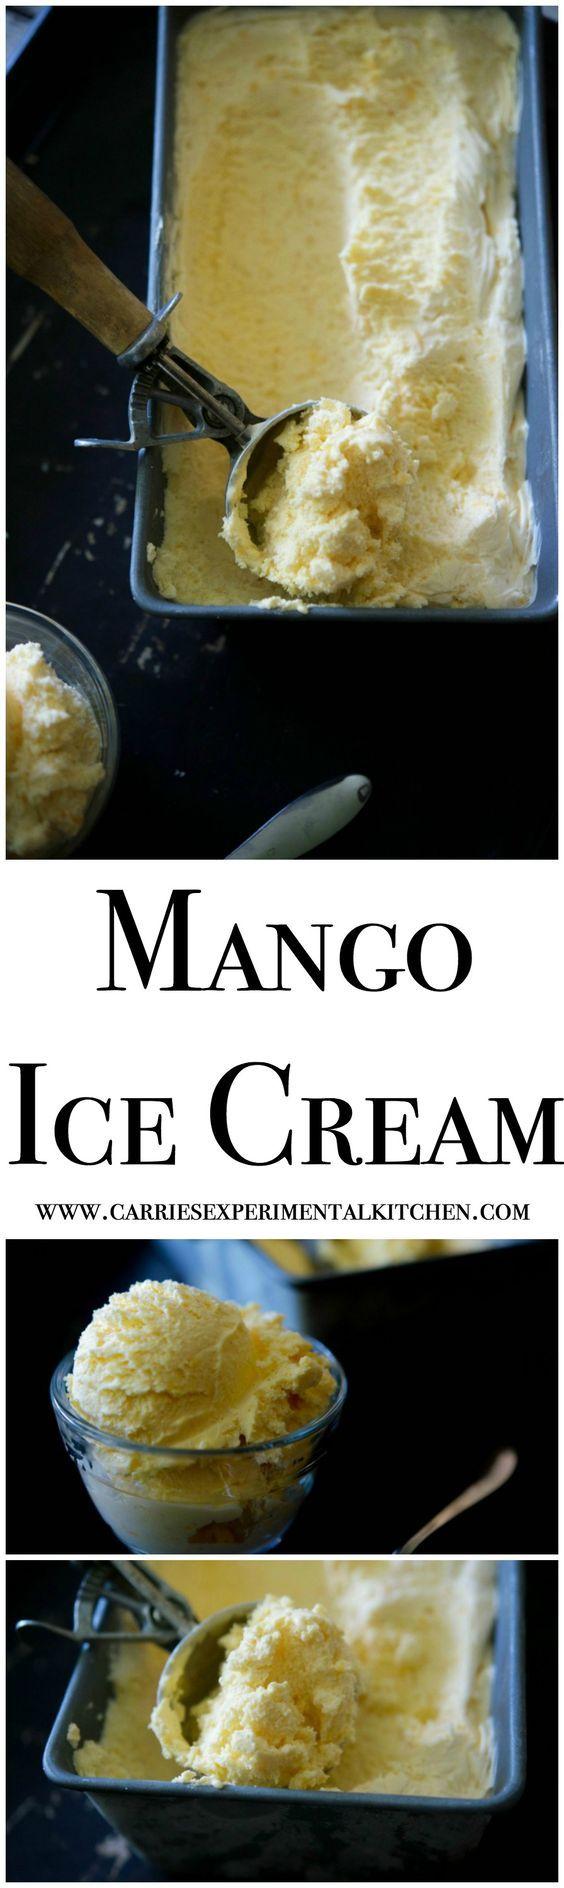 Homemade Mango Ice Cream made with sweet mangoes, heavy cream, milk, sugar and vanilla makes the perfect summertime frozen treat.